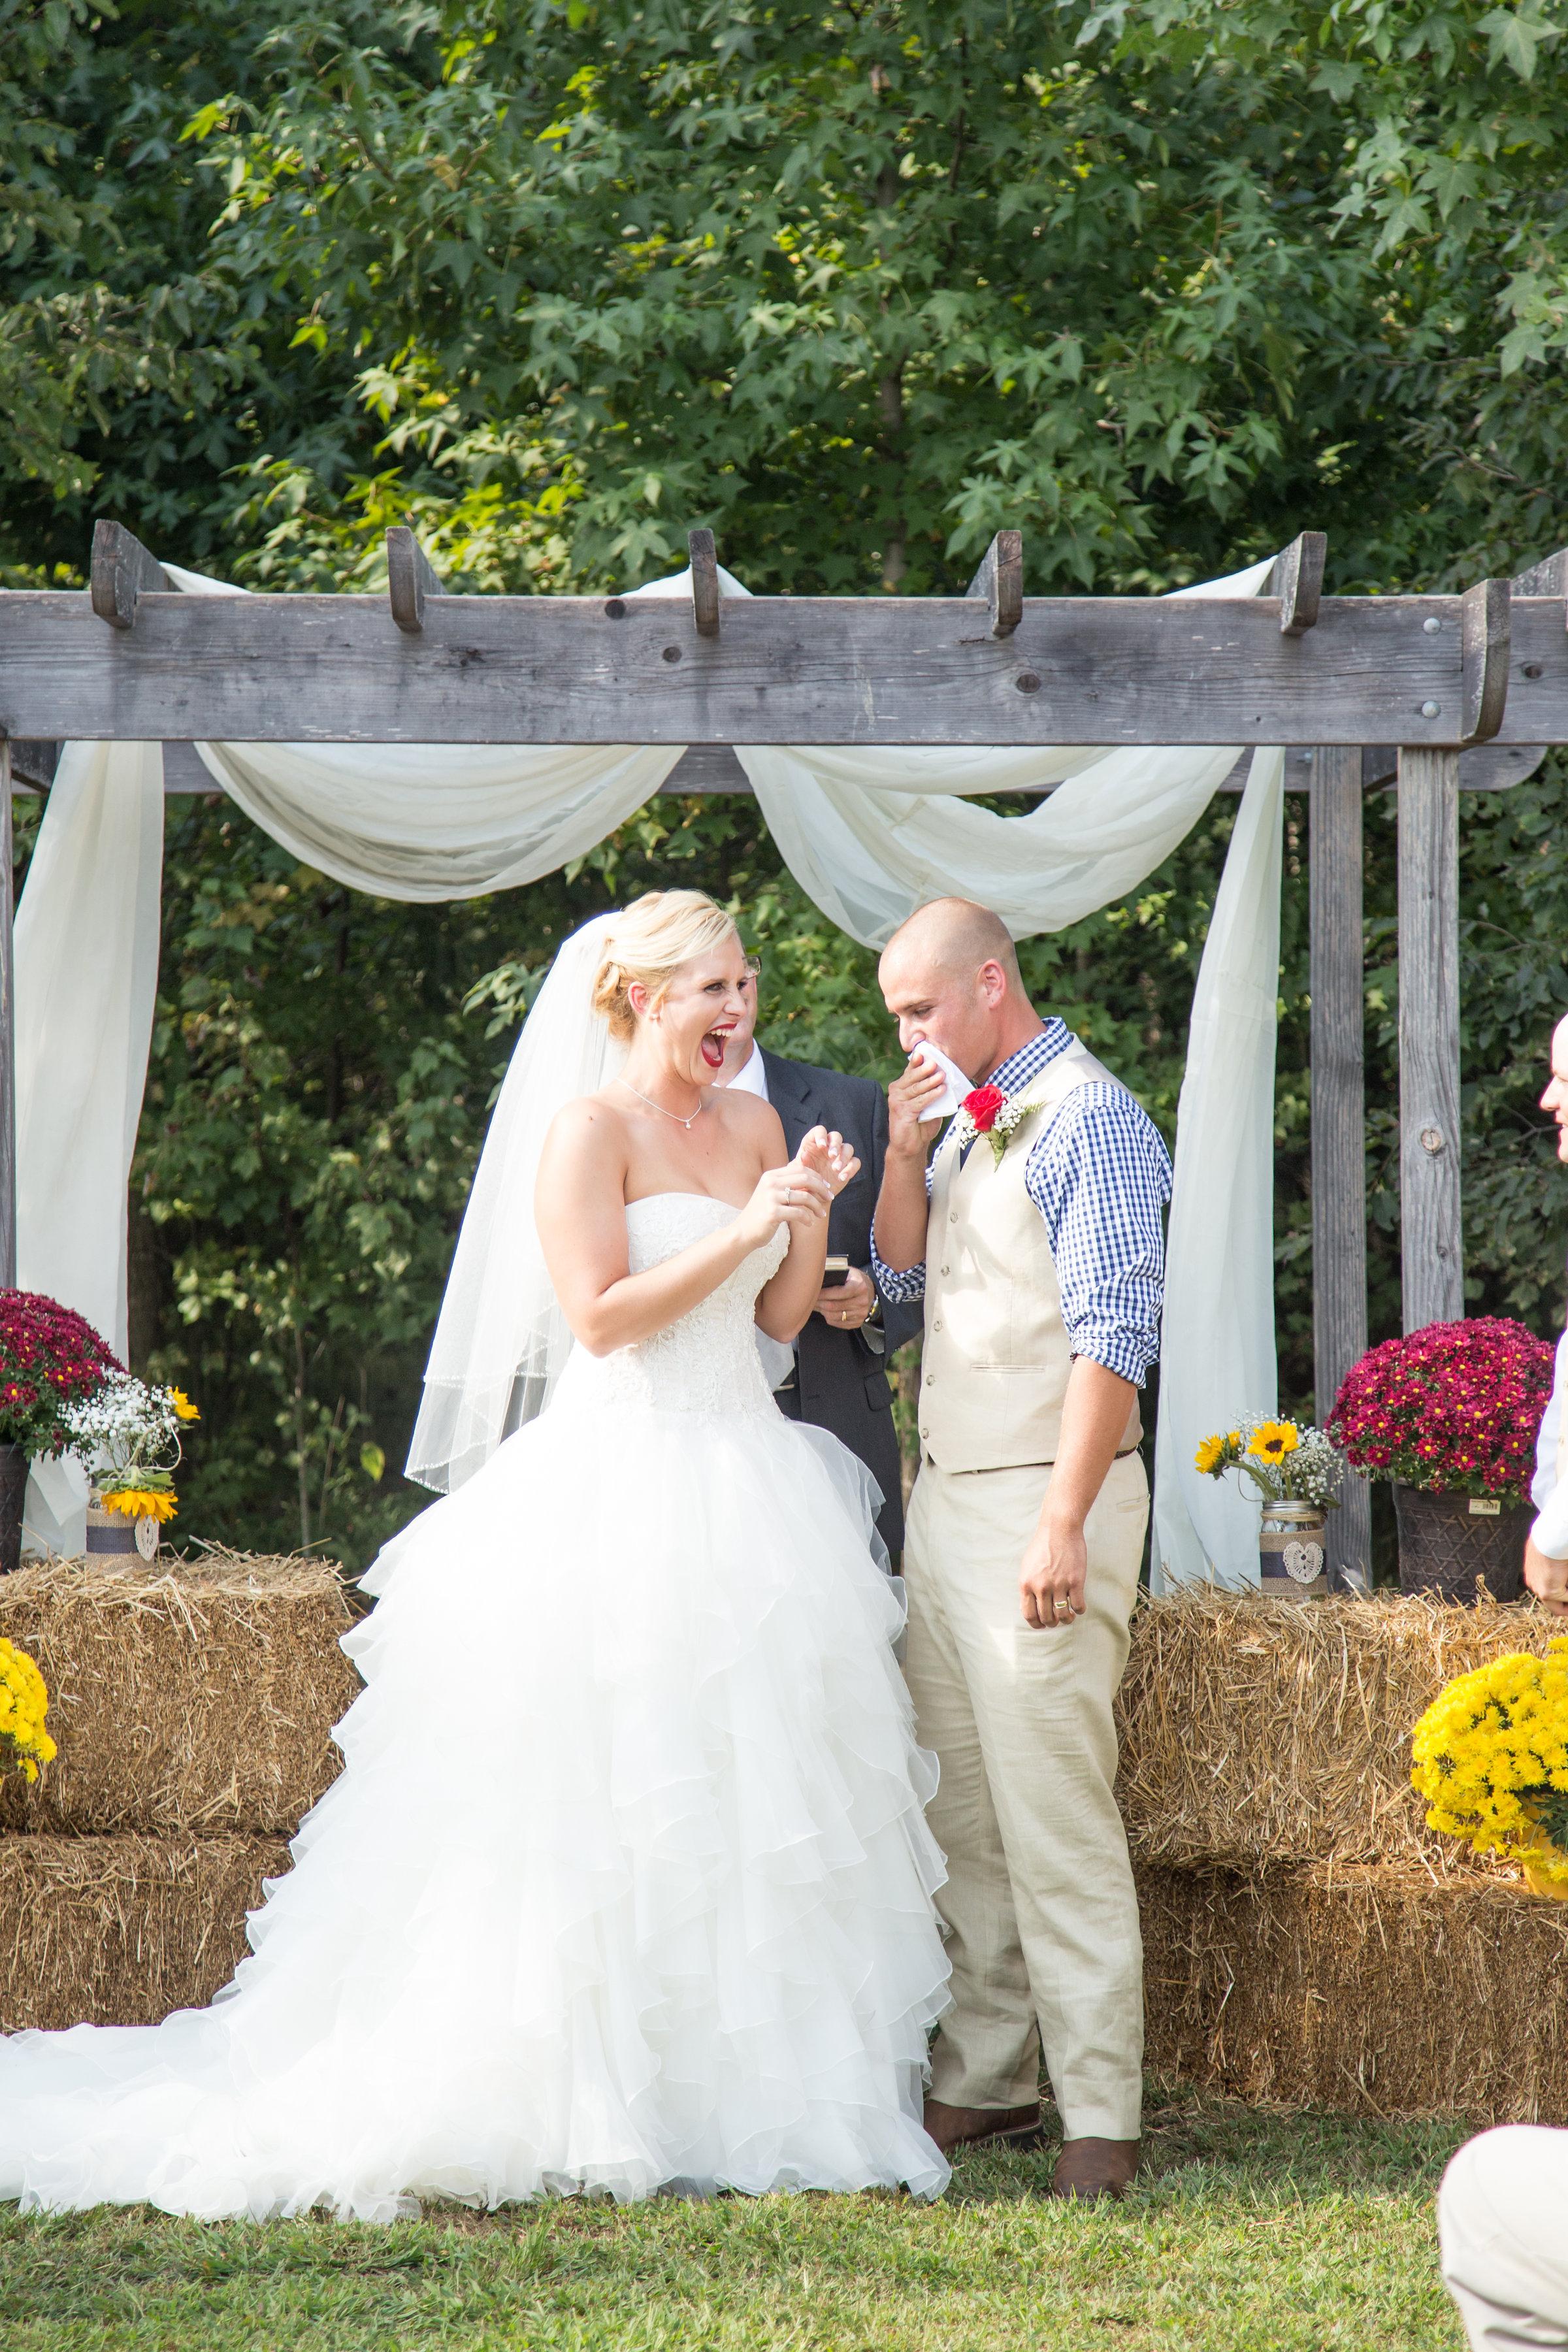 lipstick-first-kiss-wedding-bride-gown-dress-ceremony-photos.jpg